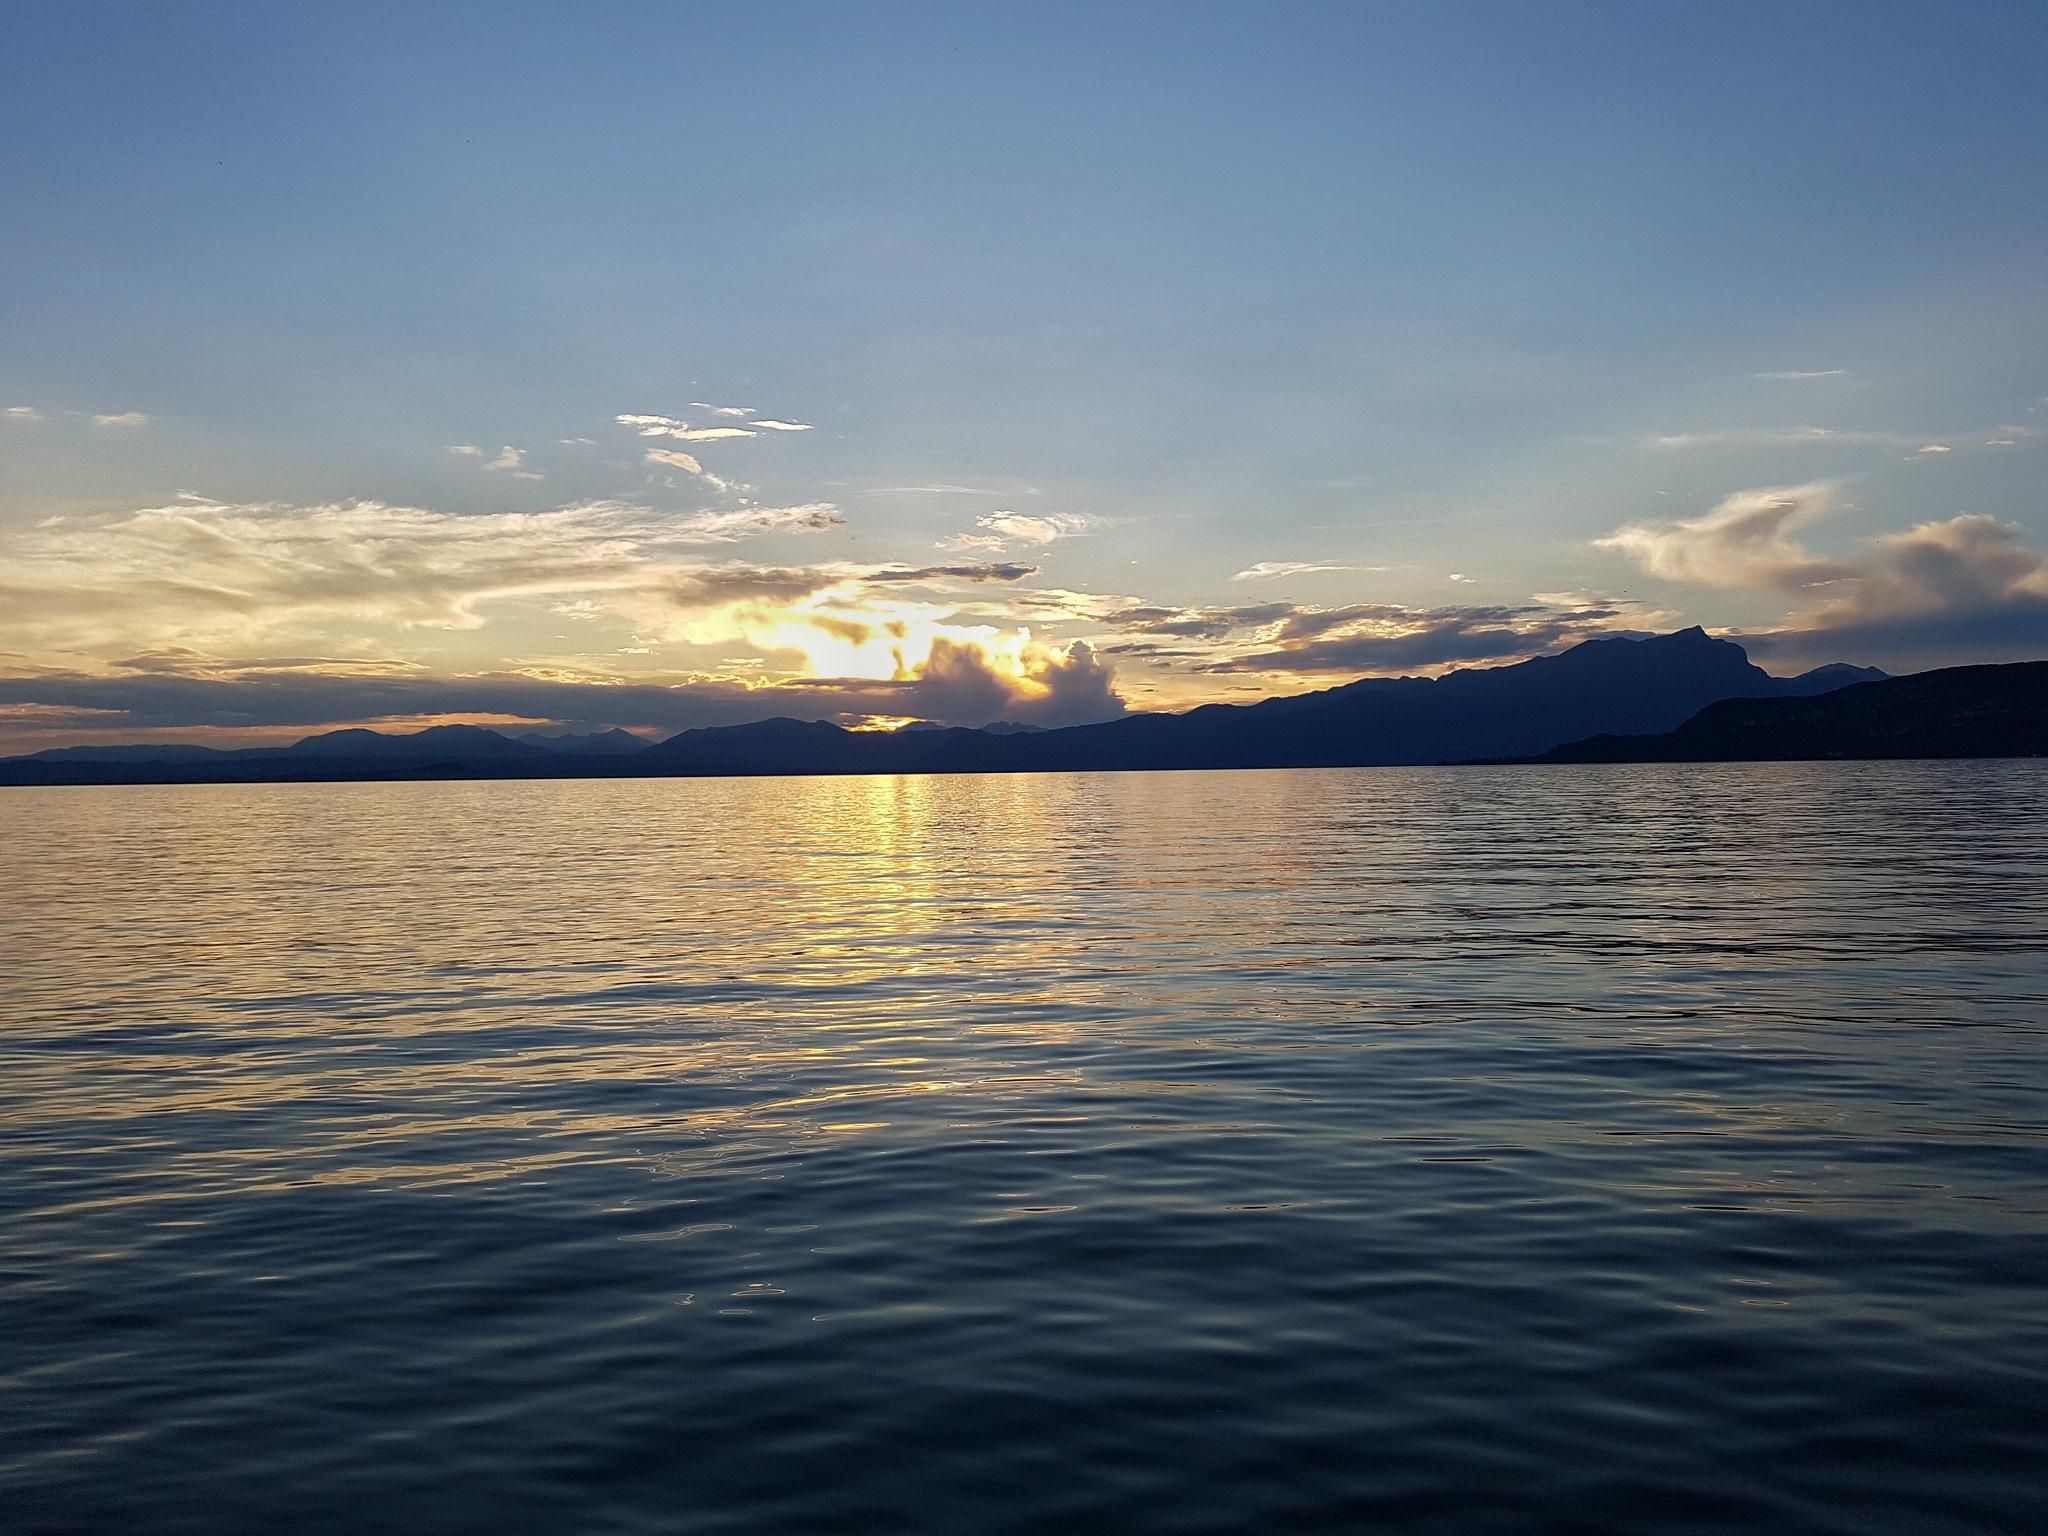 sunset from Garda lake by cicloturista62